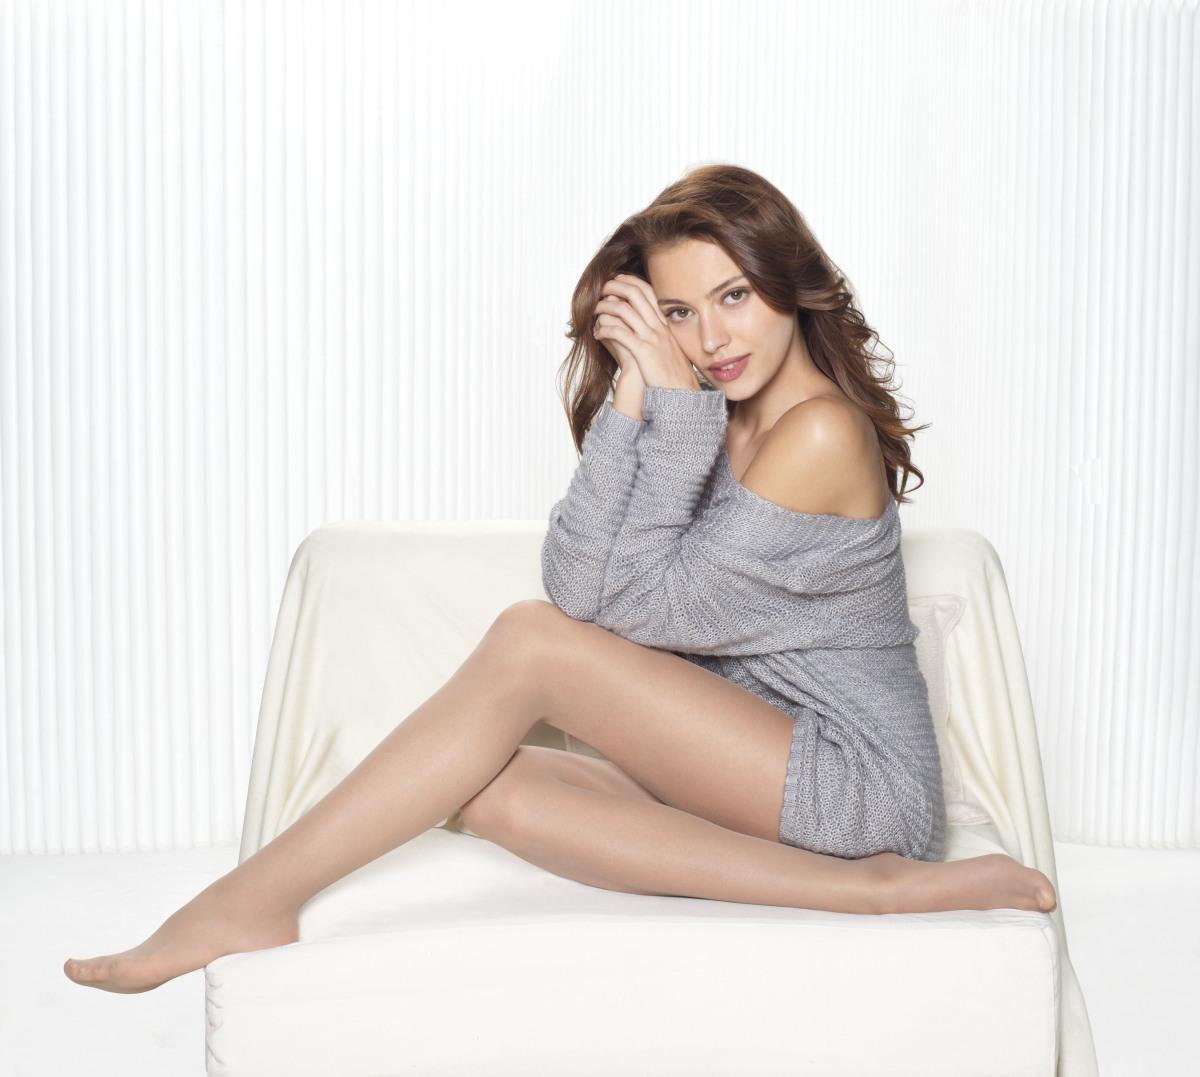 Auto erotic asphyxiation for women